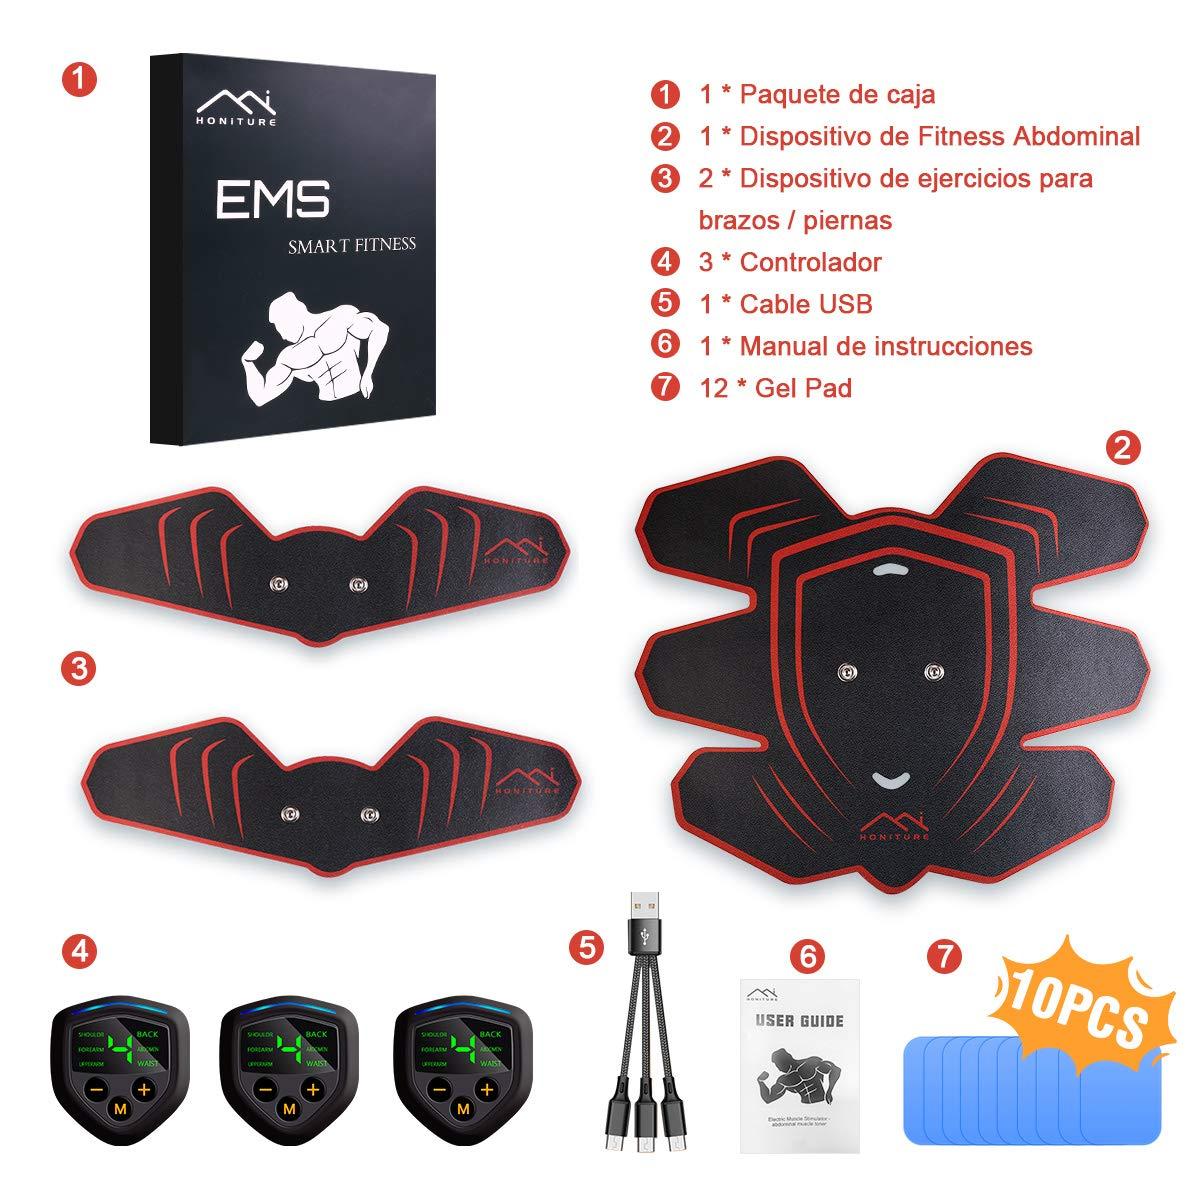 1 HONITURE Electroestimulador Muscular Abdominales Cinturon Electroestimulador Muscular